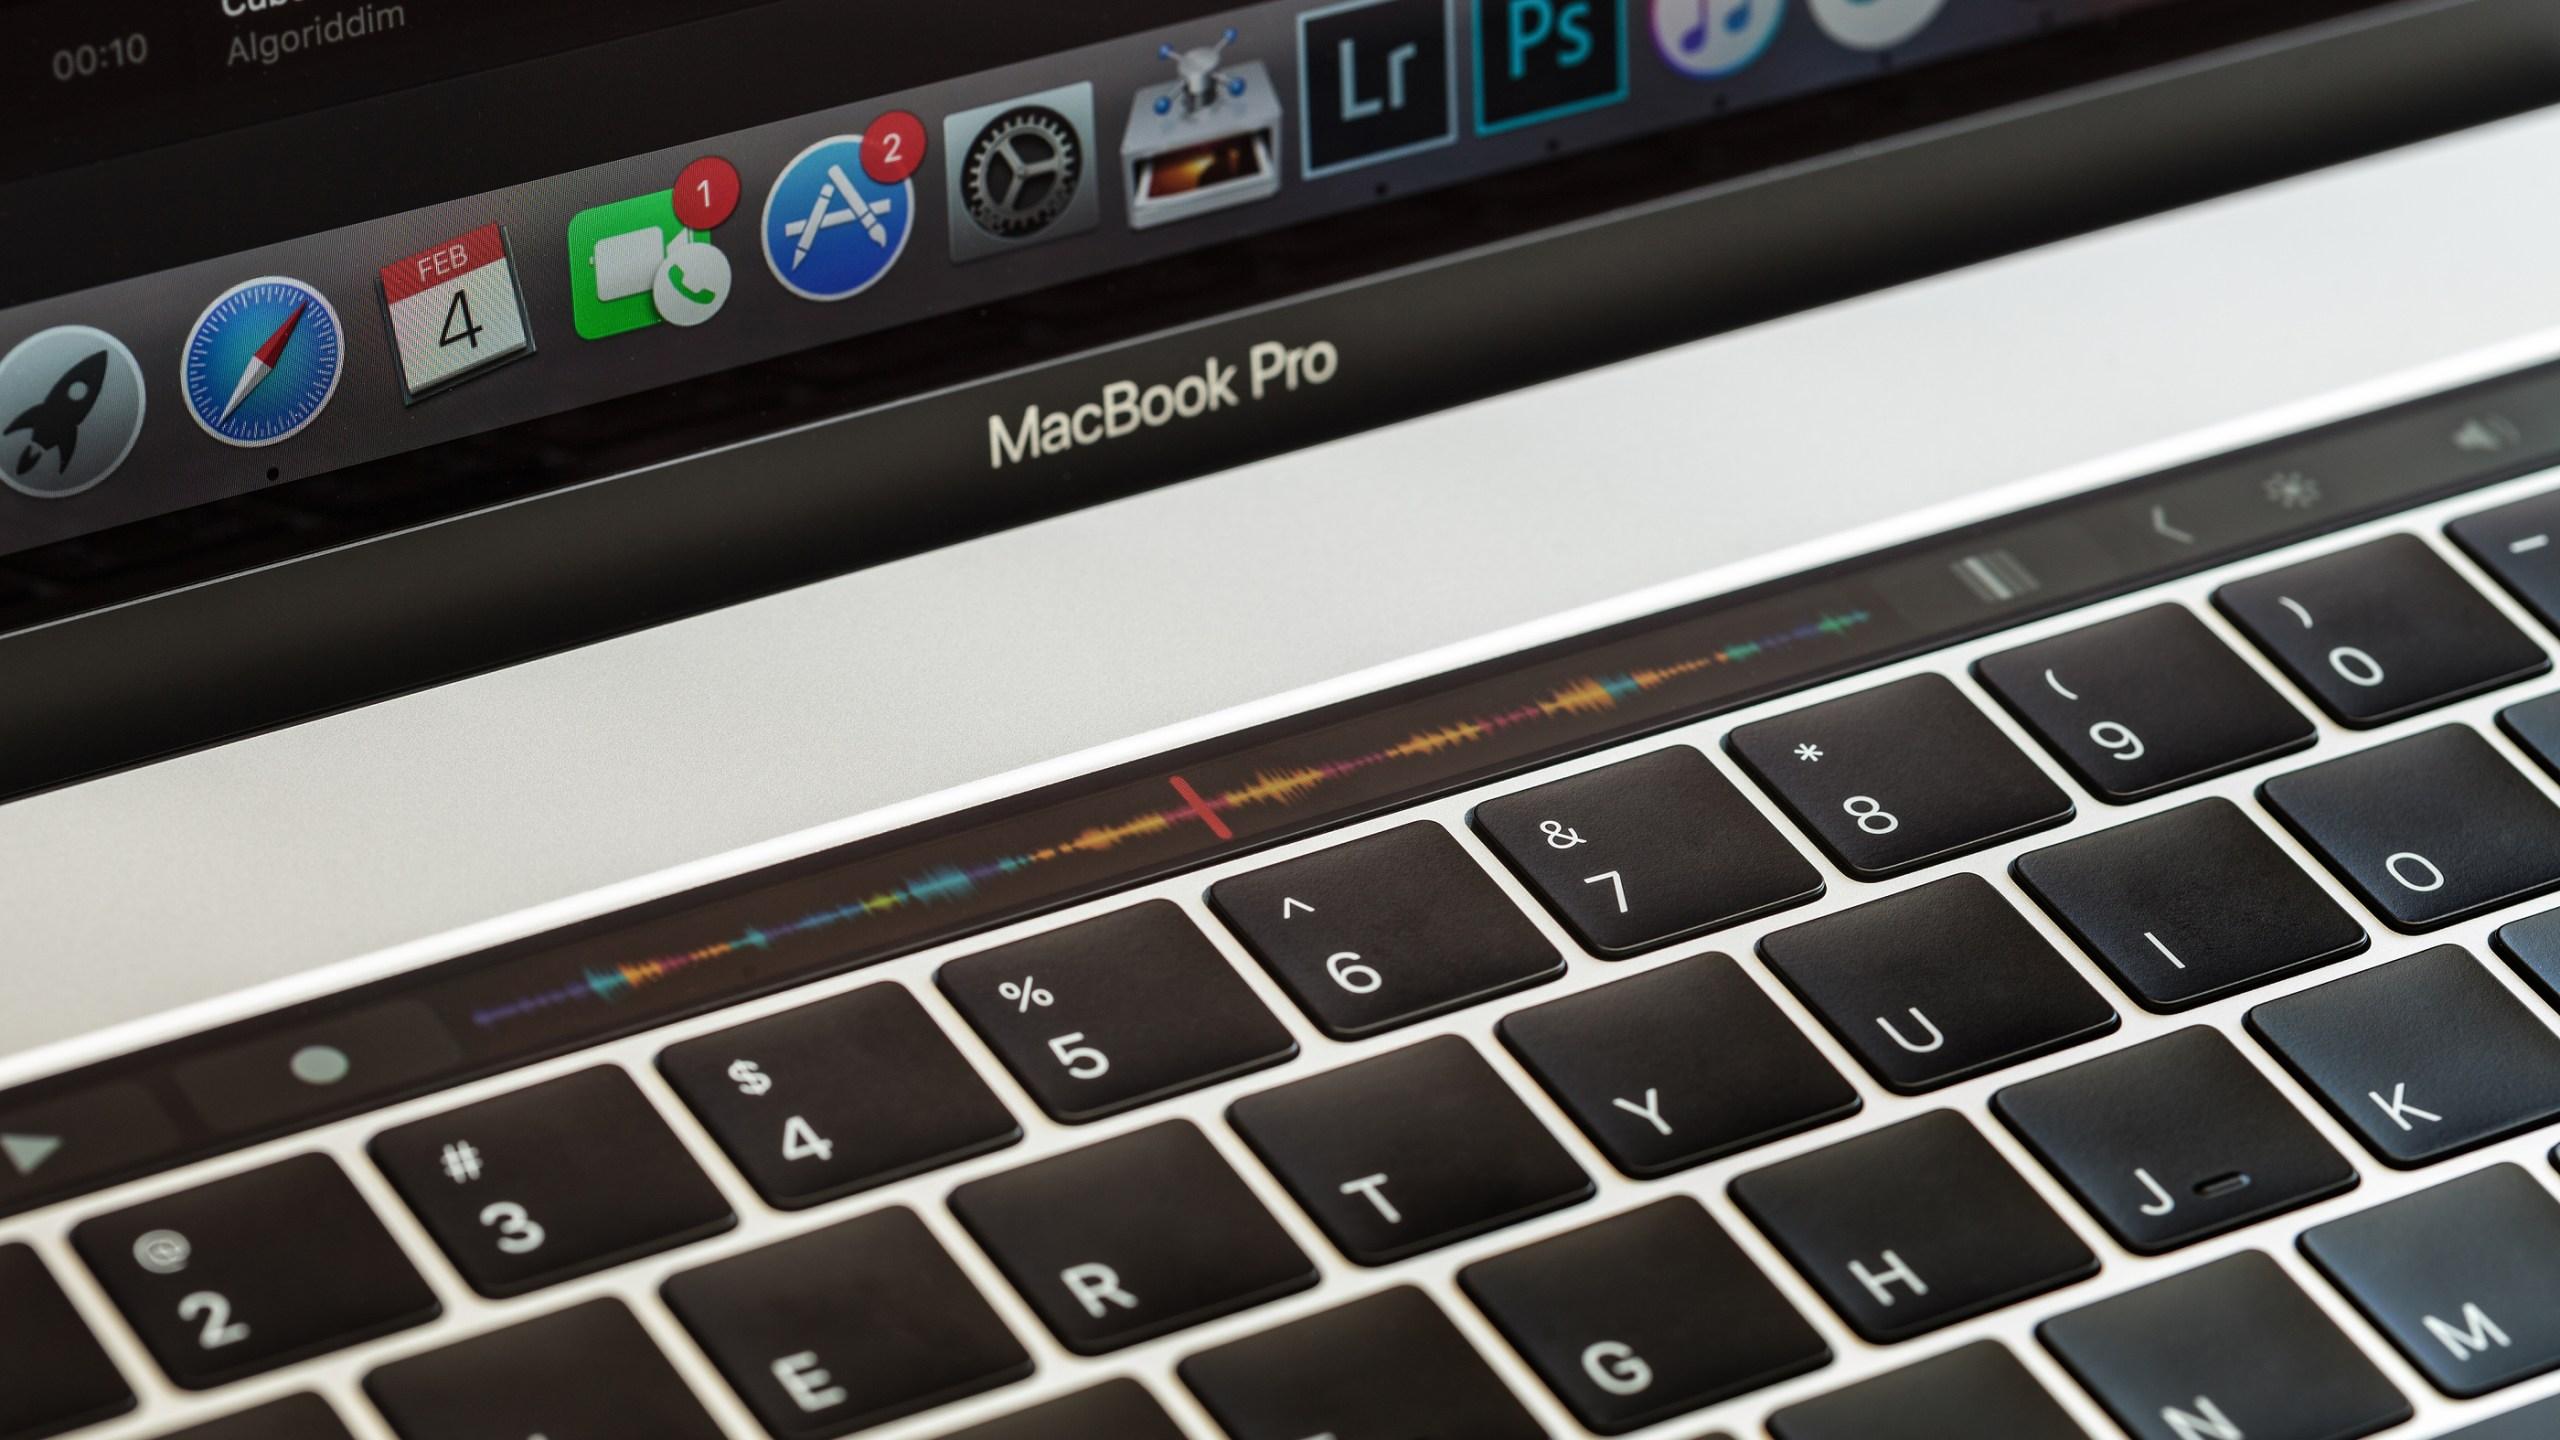 Apple S Faulty Macbook Laptop Keyboard Results In Class Action Lawsuit